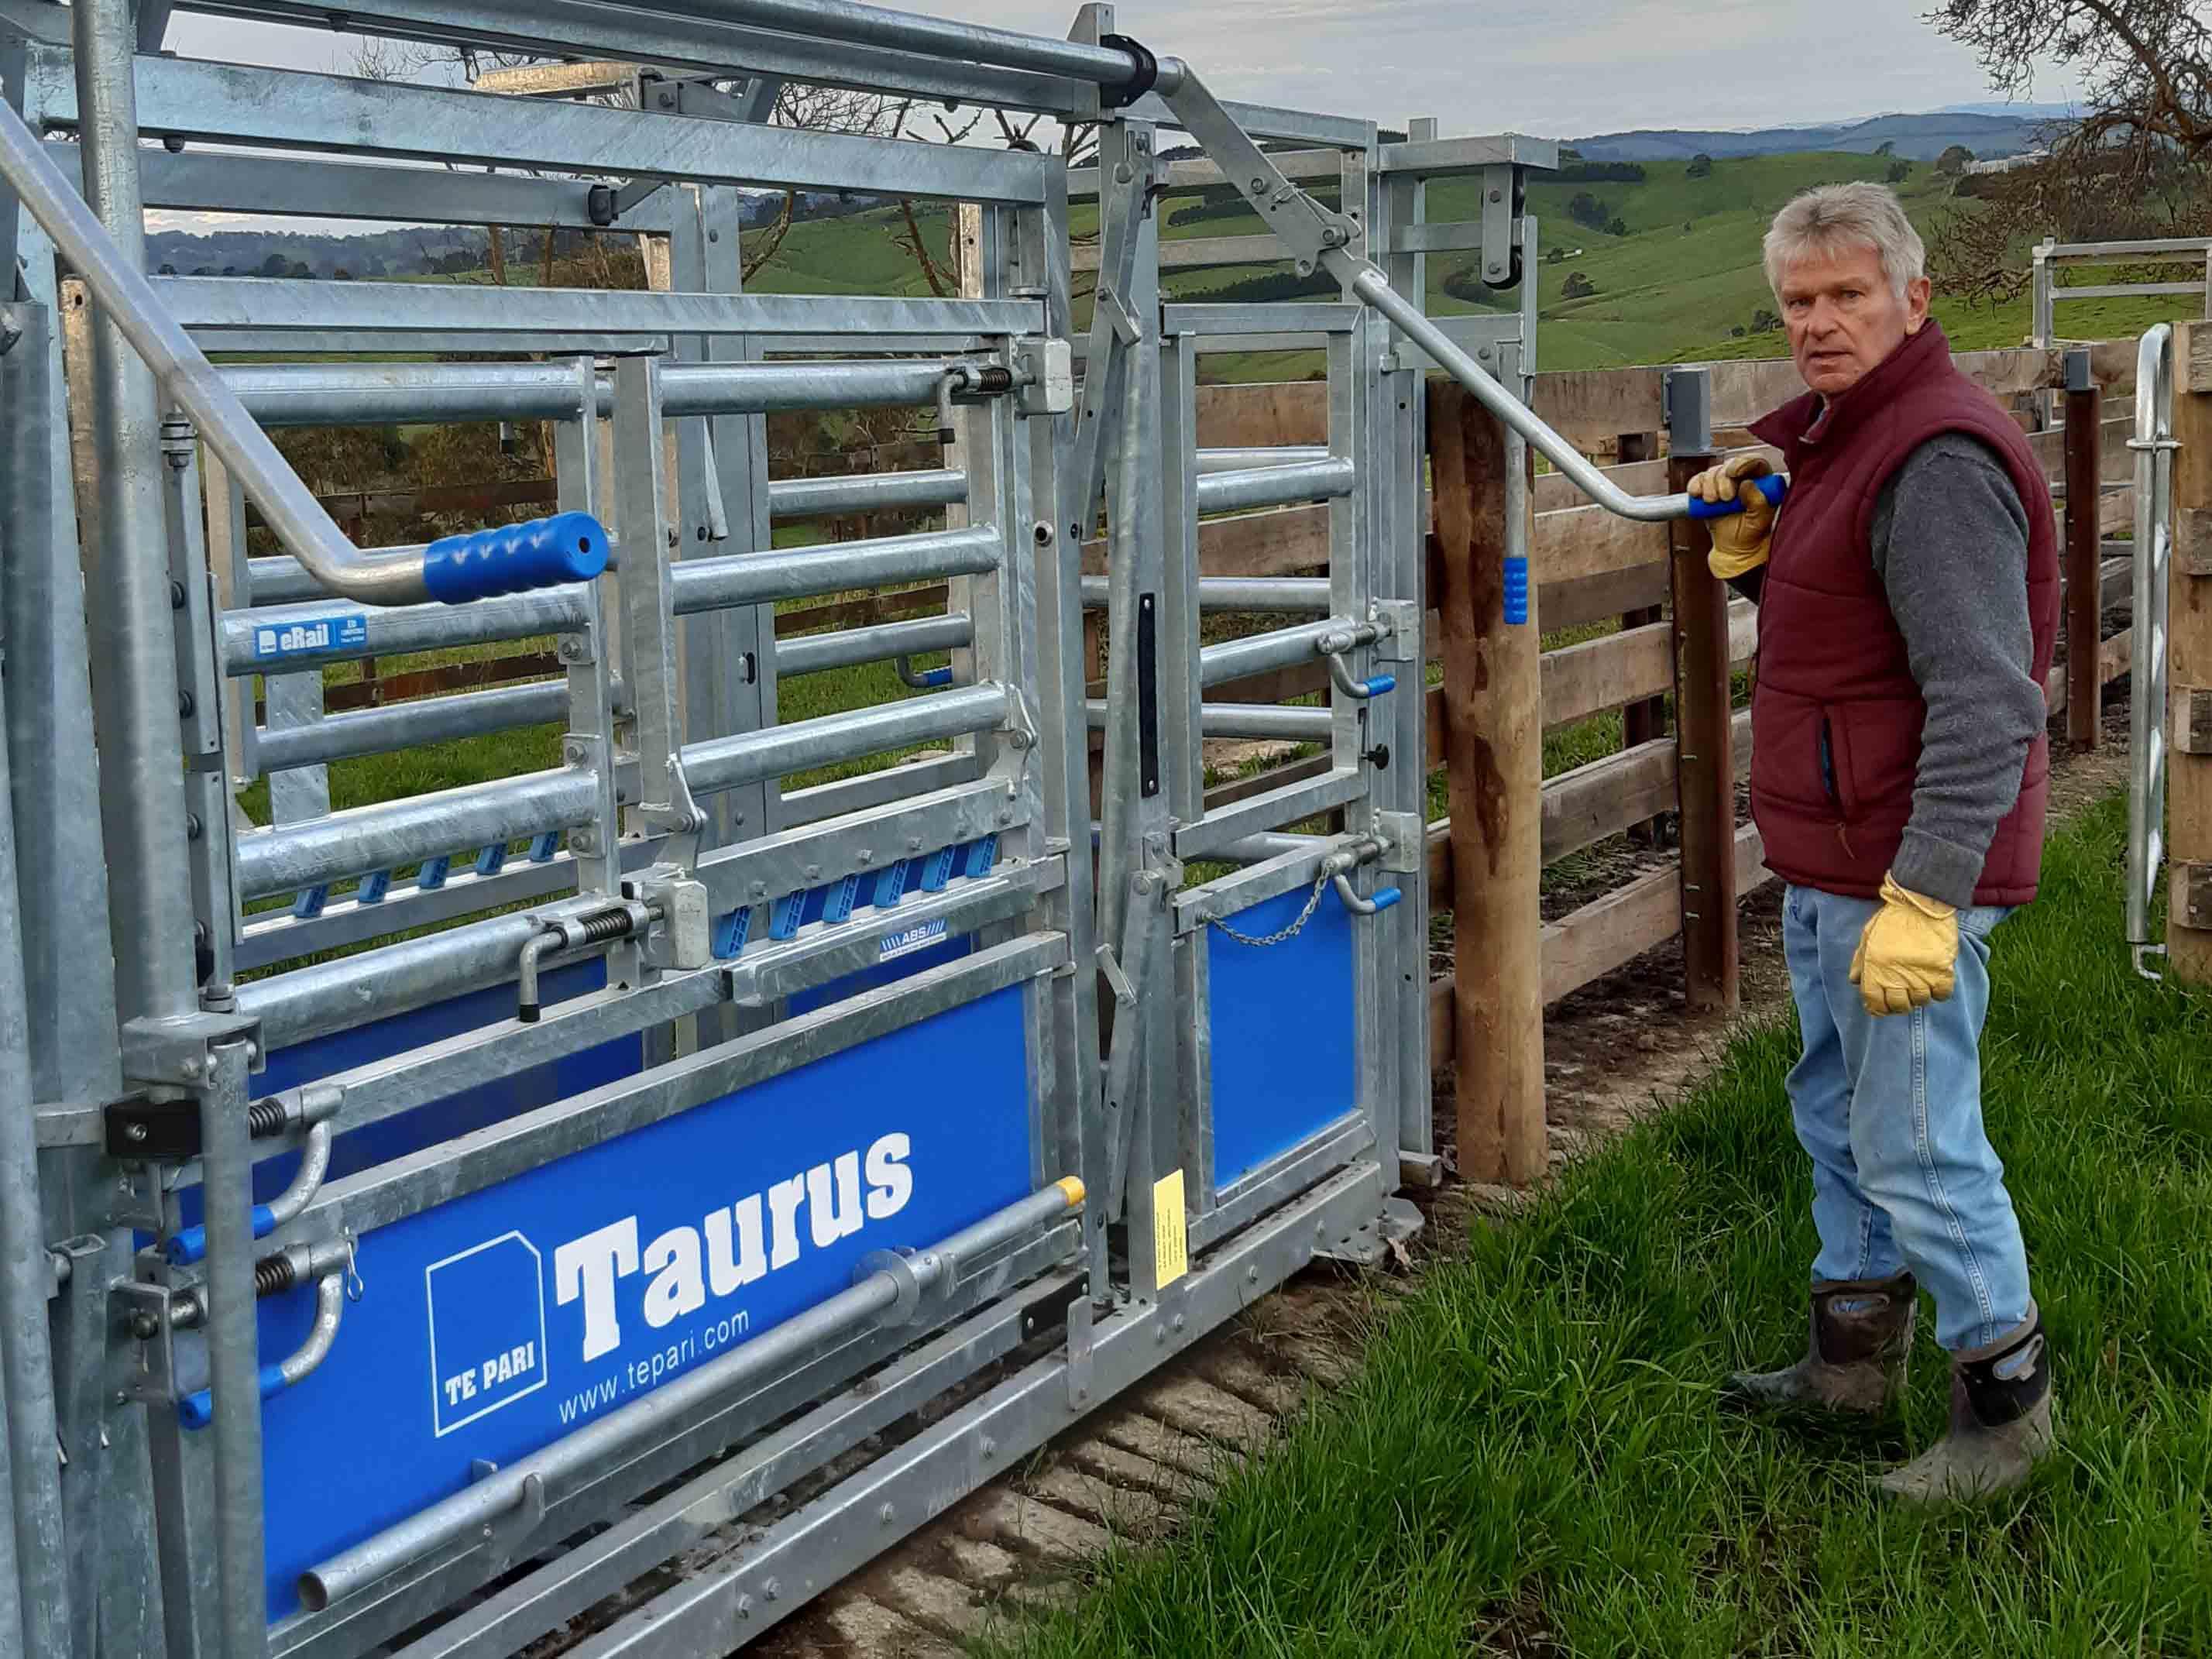 bruce clark with his taurus cattle crush by te pari australia showing rear handle